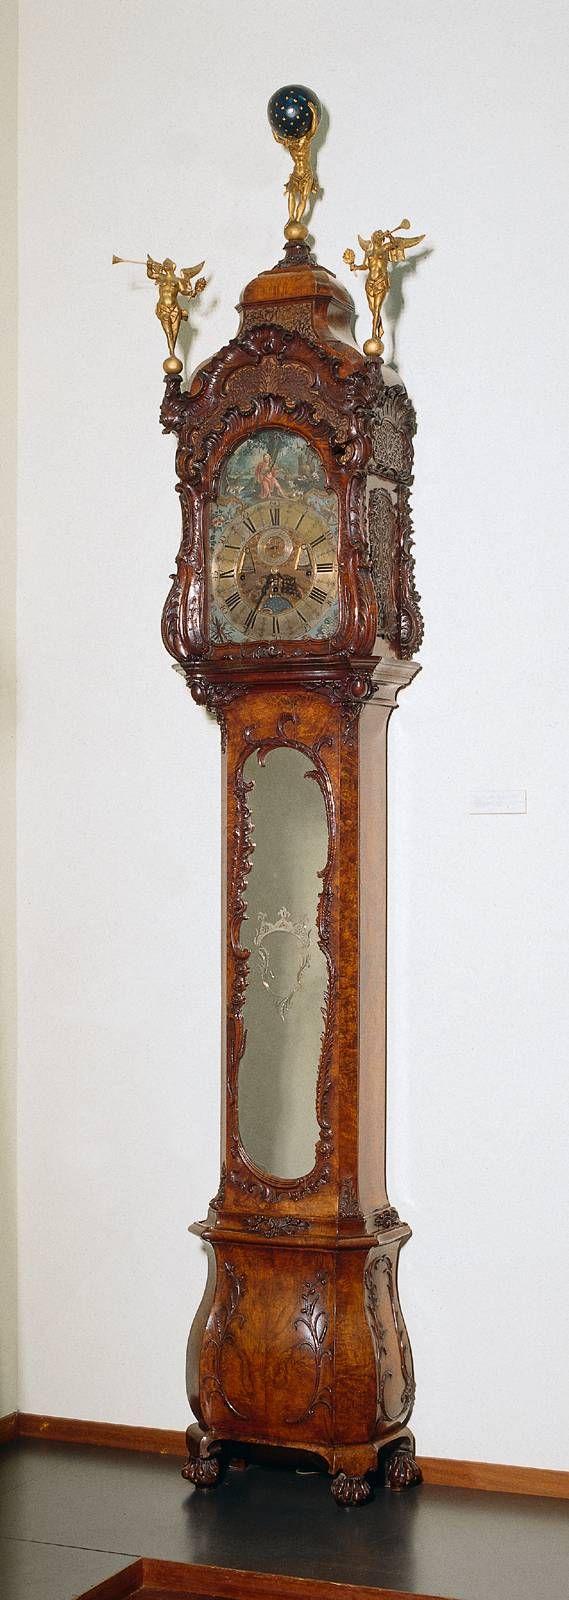 longcase clock 1750 breda